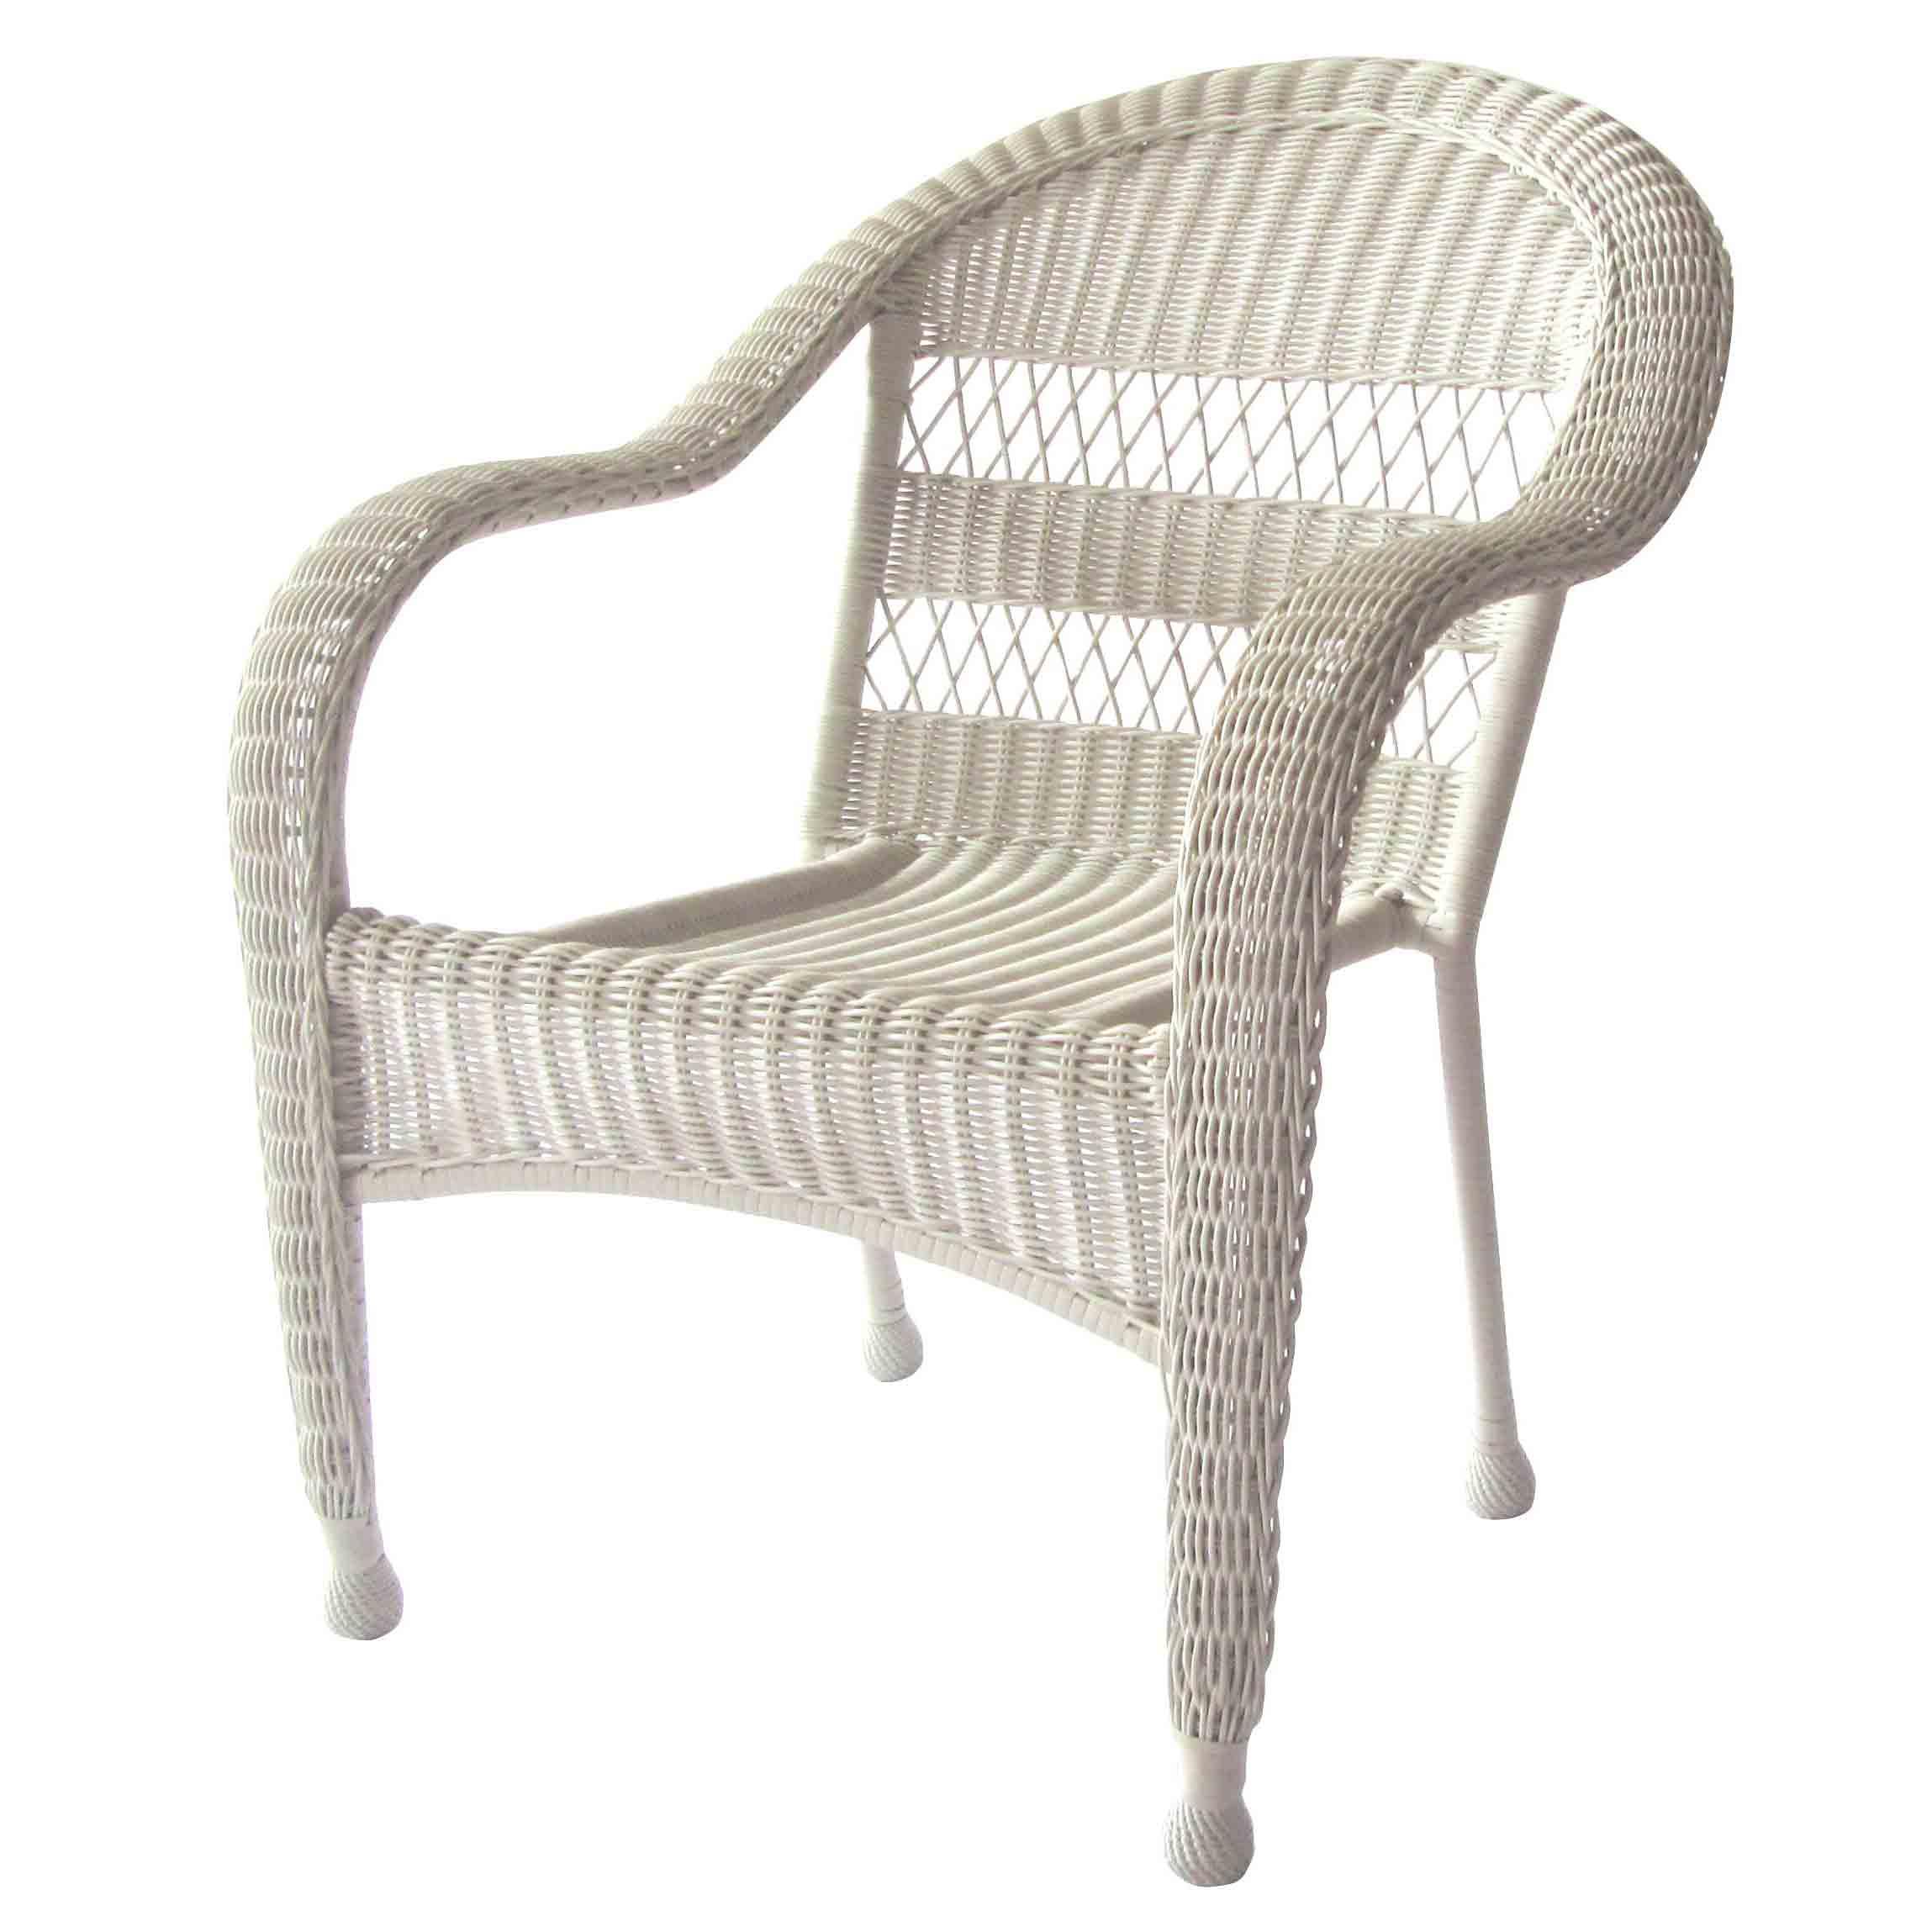 Professional Design Outdoor Wicker Furniture - JJC1012W Steel Frame Stacking Wicker Chair – Jin-jiang Industry